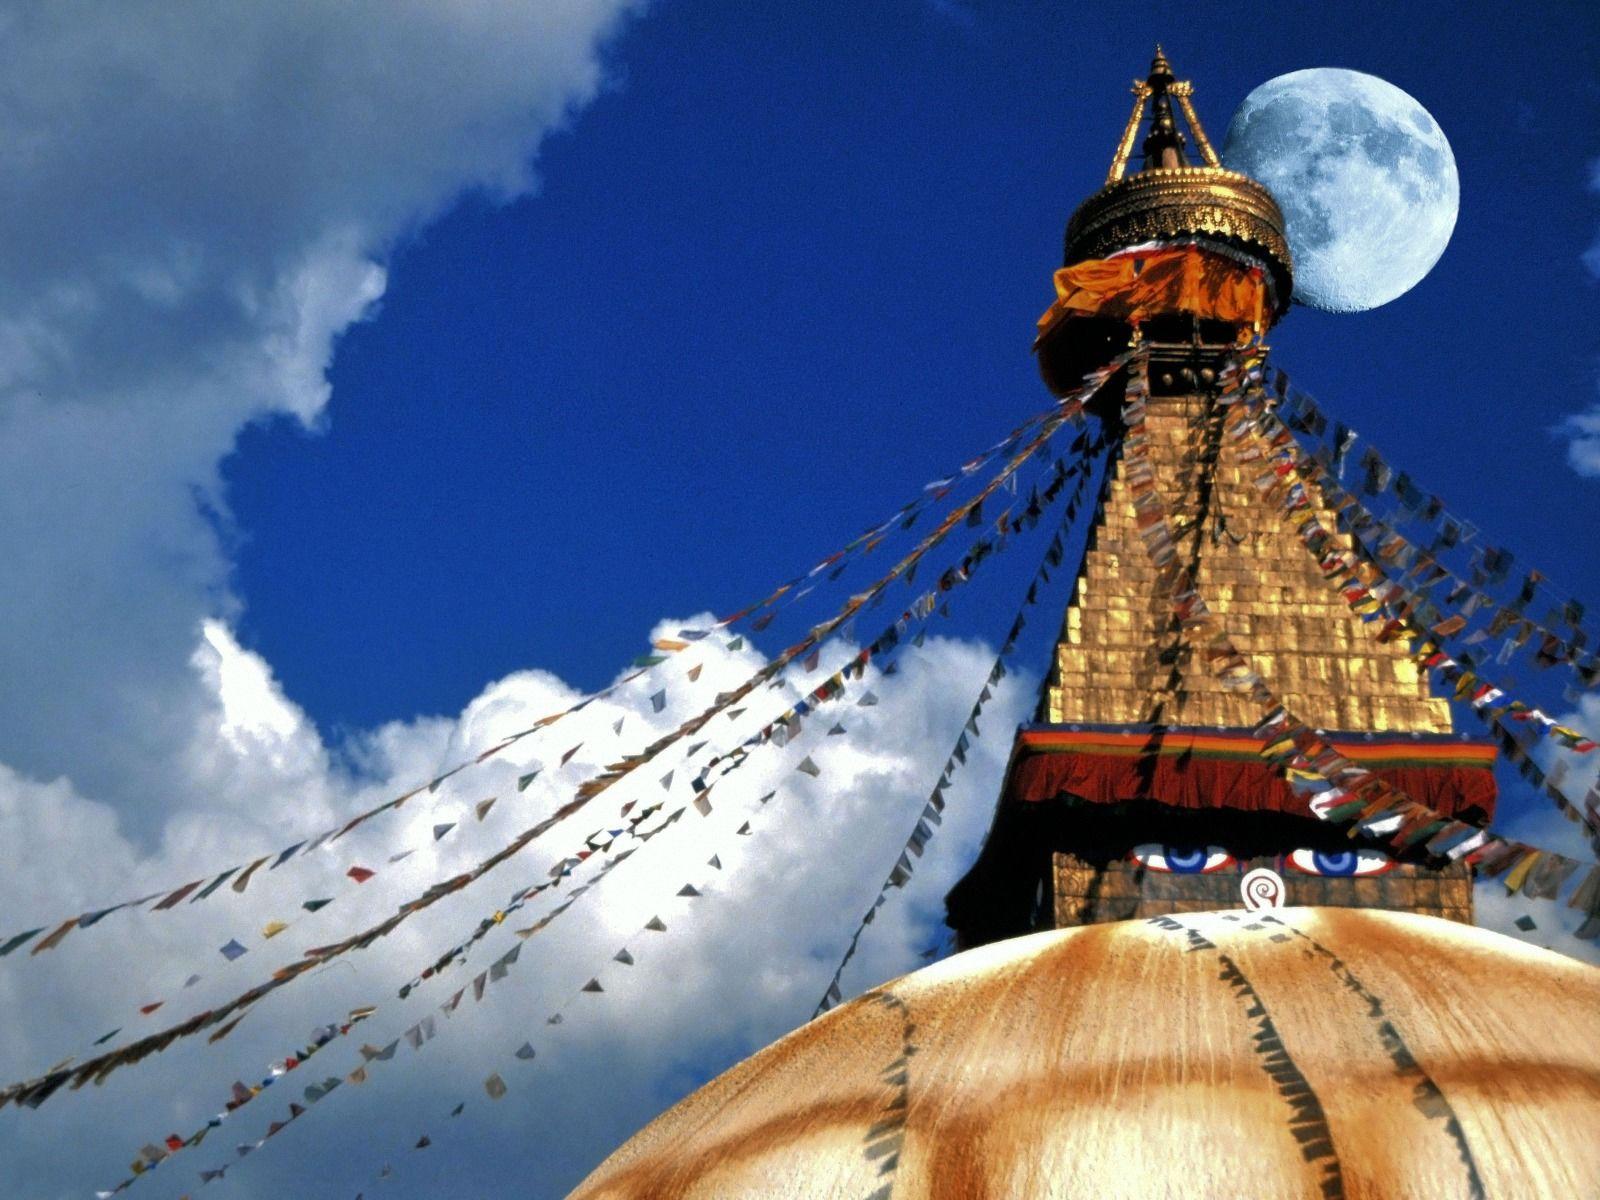 Circuito India y Nepal: Rutas del Rajasthan y Kathmandú